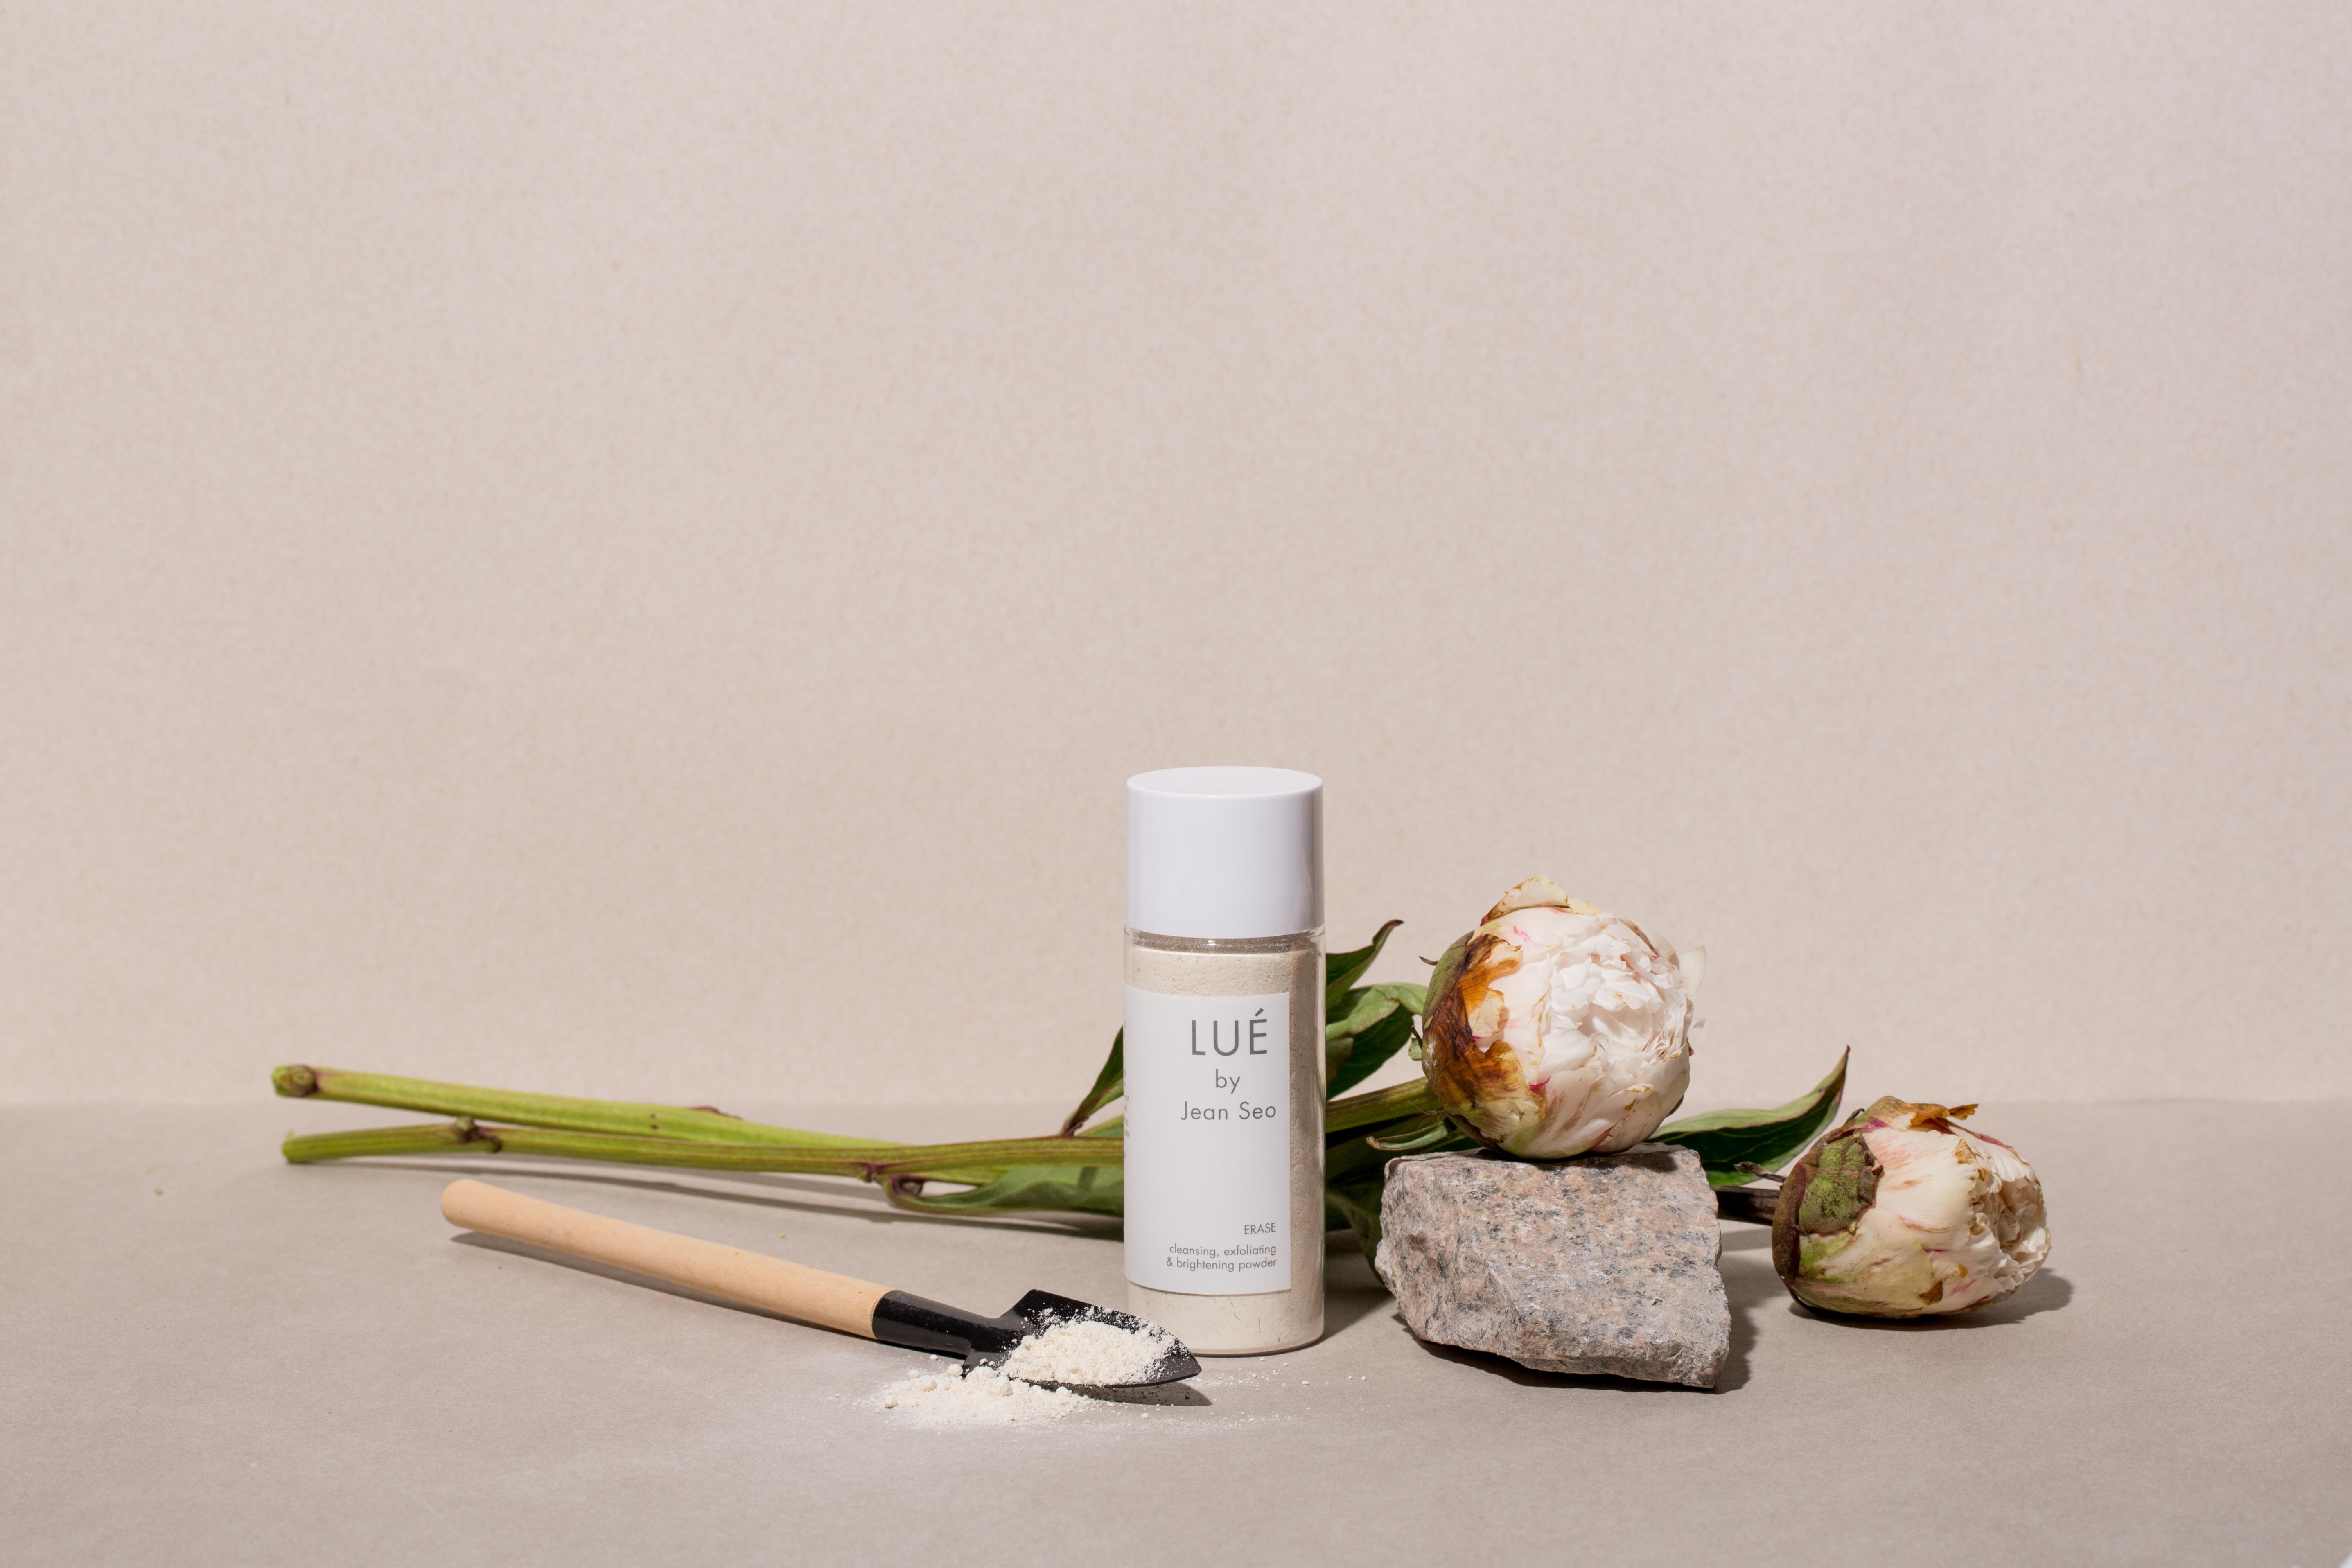 LUE BY JEAN SEO ERASE 燕麥飄霜 HK$320 集清潔、磨砂及提亮肌膚三大功效於一身,由全燕麥粒子、脫脂奶粉及碳酸鎂混合而成,溫幼細的粒子能夠減淡疤痕及皺紋,可作為日常潔面產品使用。同時預防毛孔堵塞問題,清除黑頭和角質;脫脂奶粉成分可為肌膚帶來滋潤感及養分,使膚質更嫩滑有光澤。